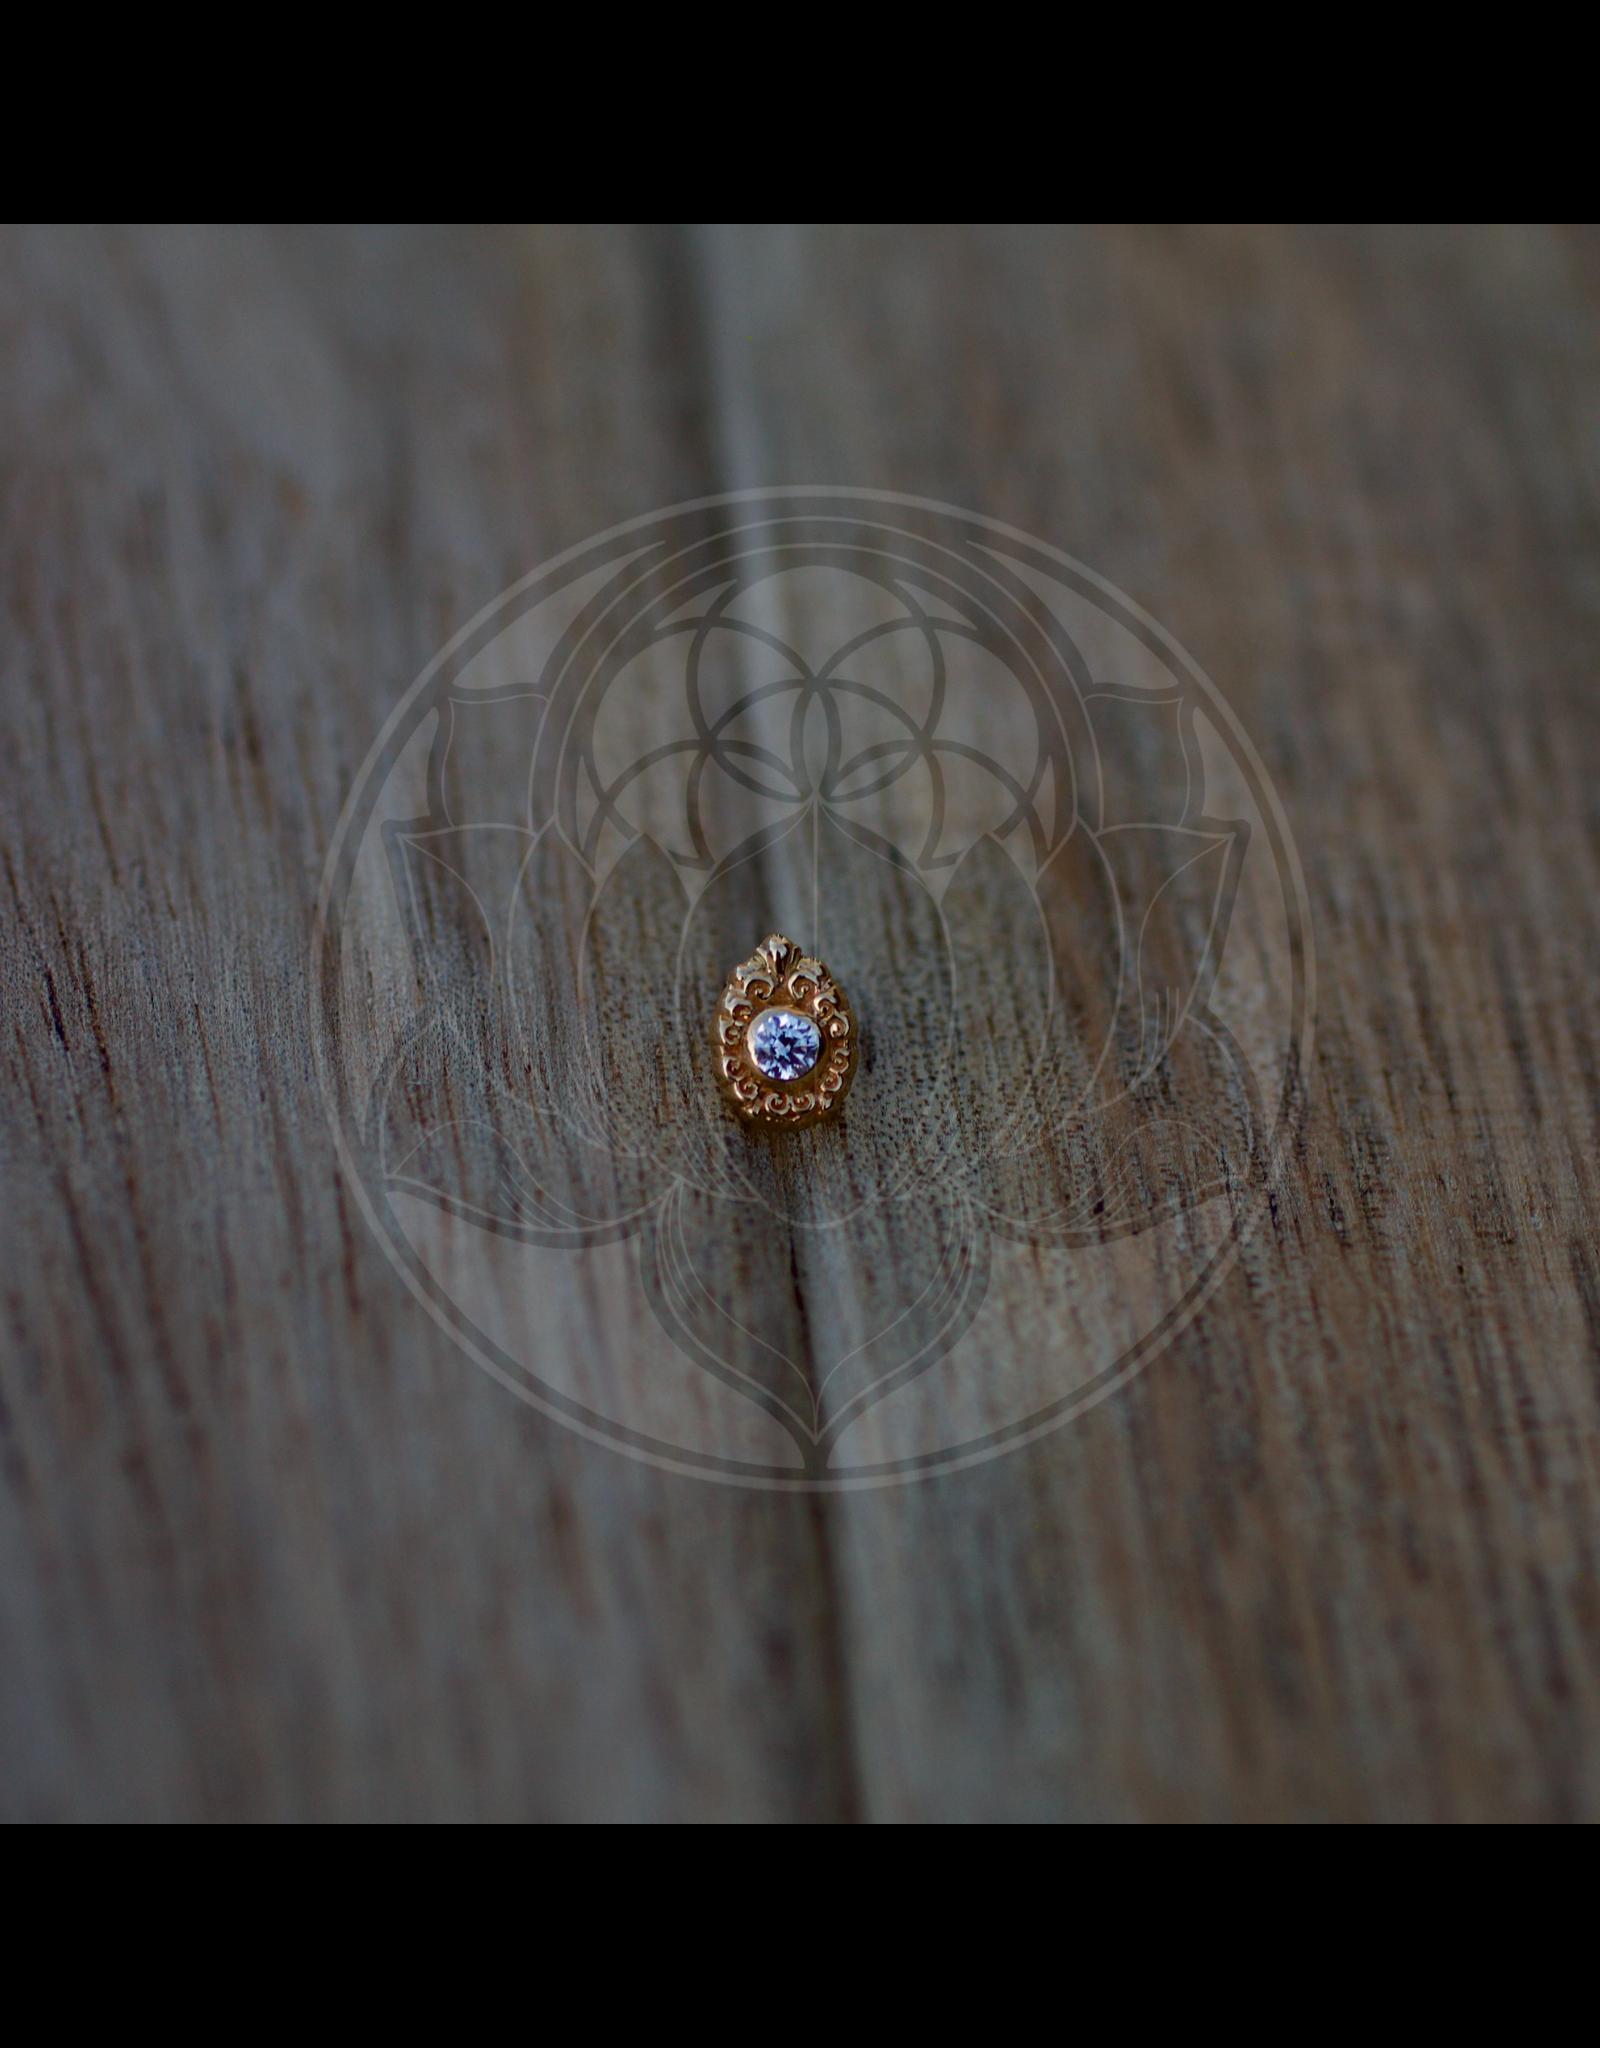 14k YG Elegance Filagree Pear (2mm Bezel) 6mm Threadless Pin